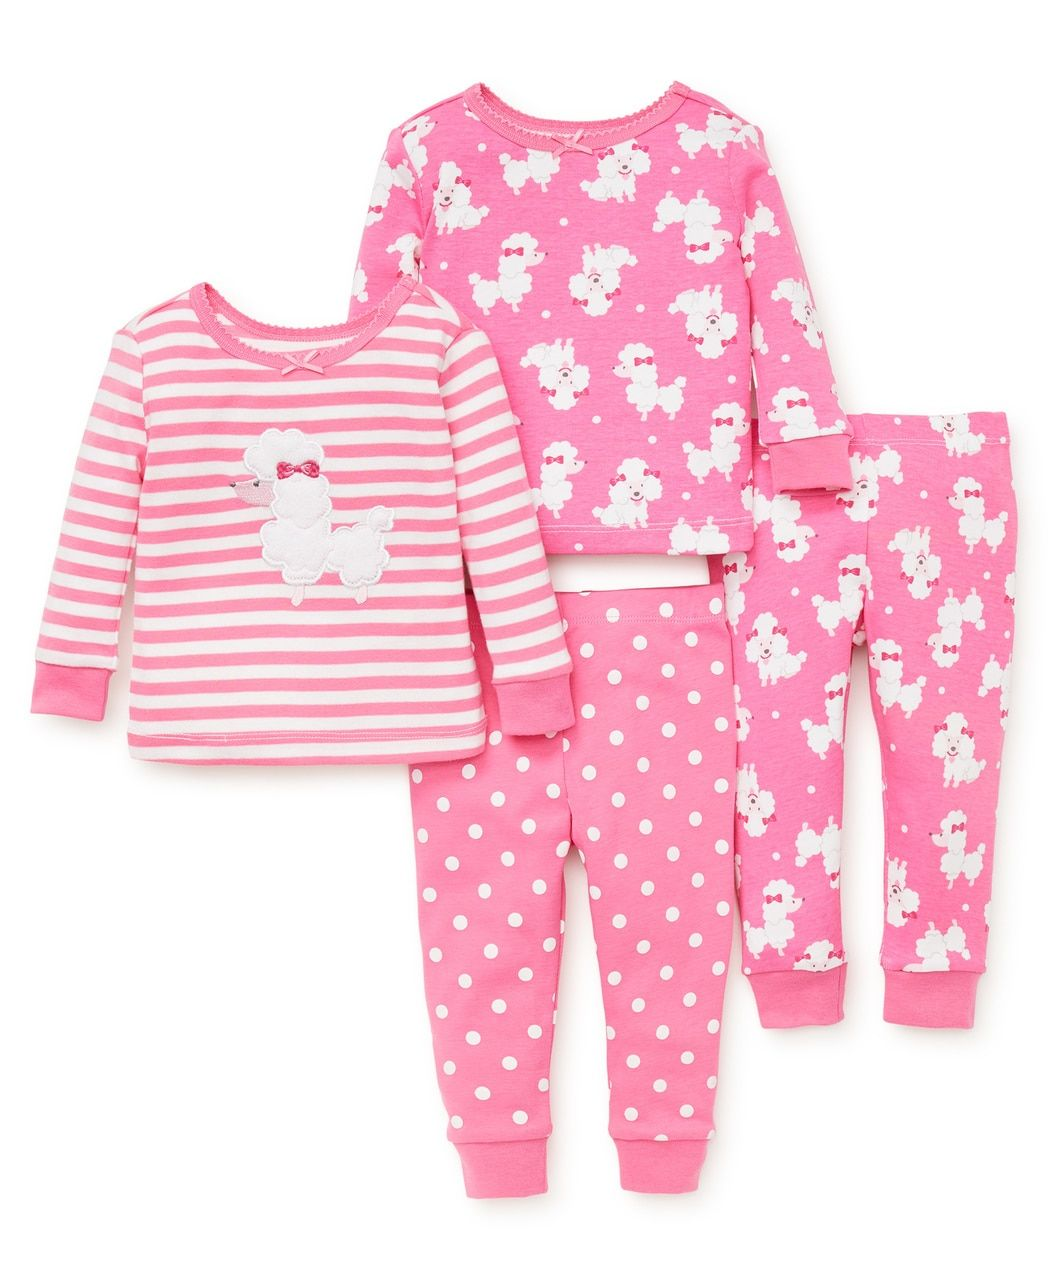 5504ad0958 Poodle 4-Piece Pajama Set | Baby fashion | Pinterest | Pajama set ...